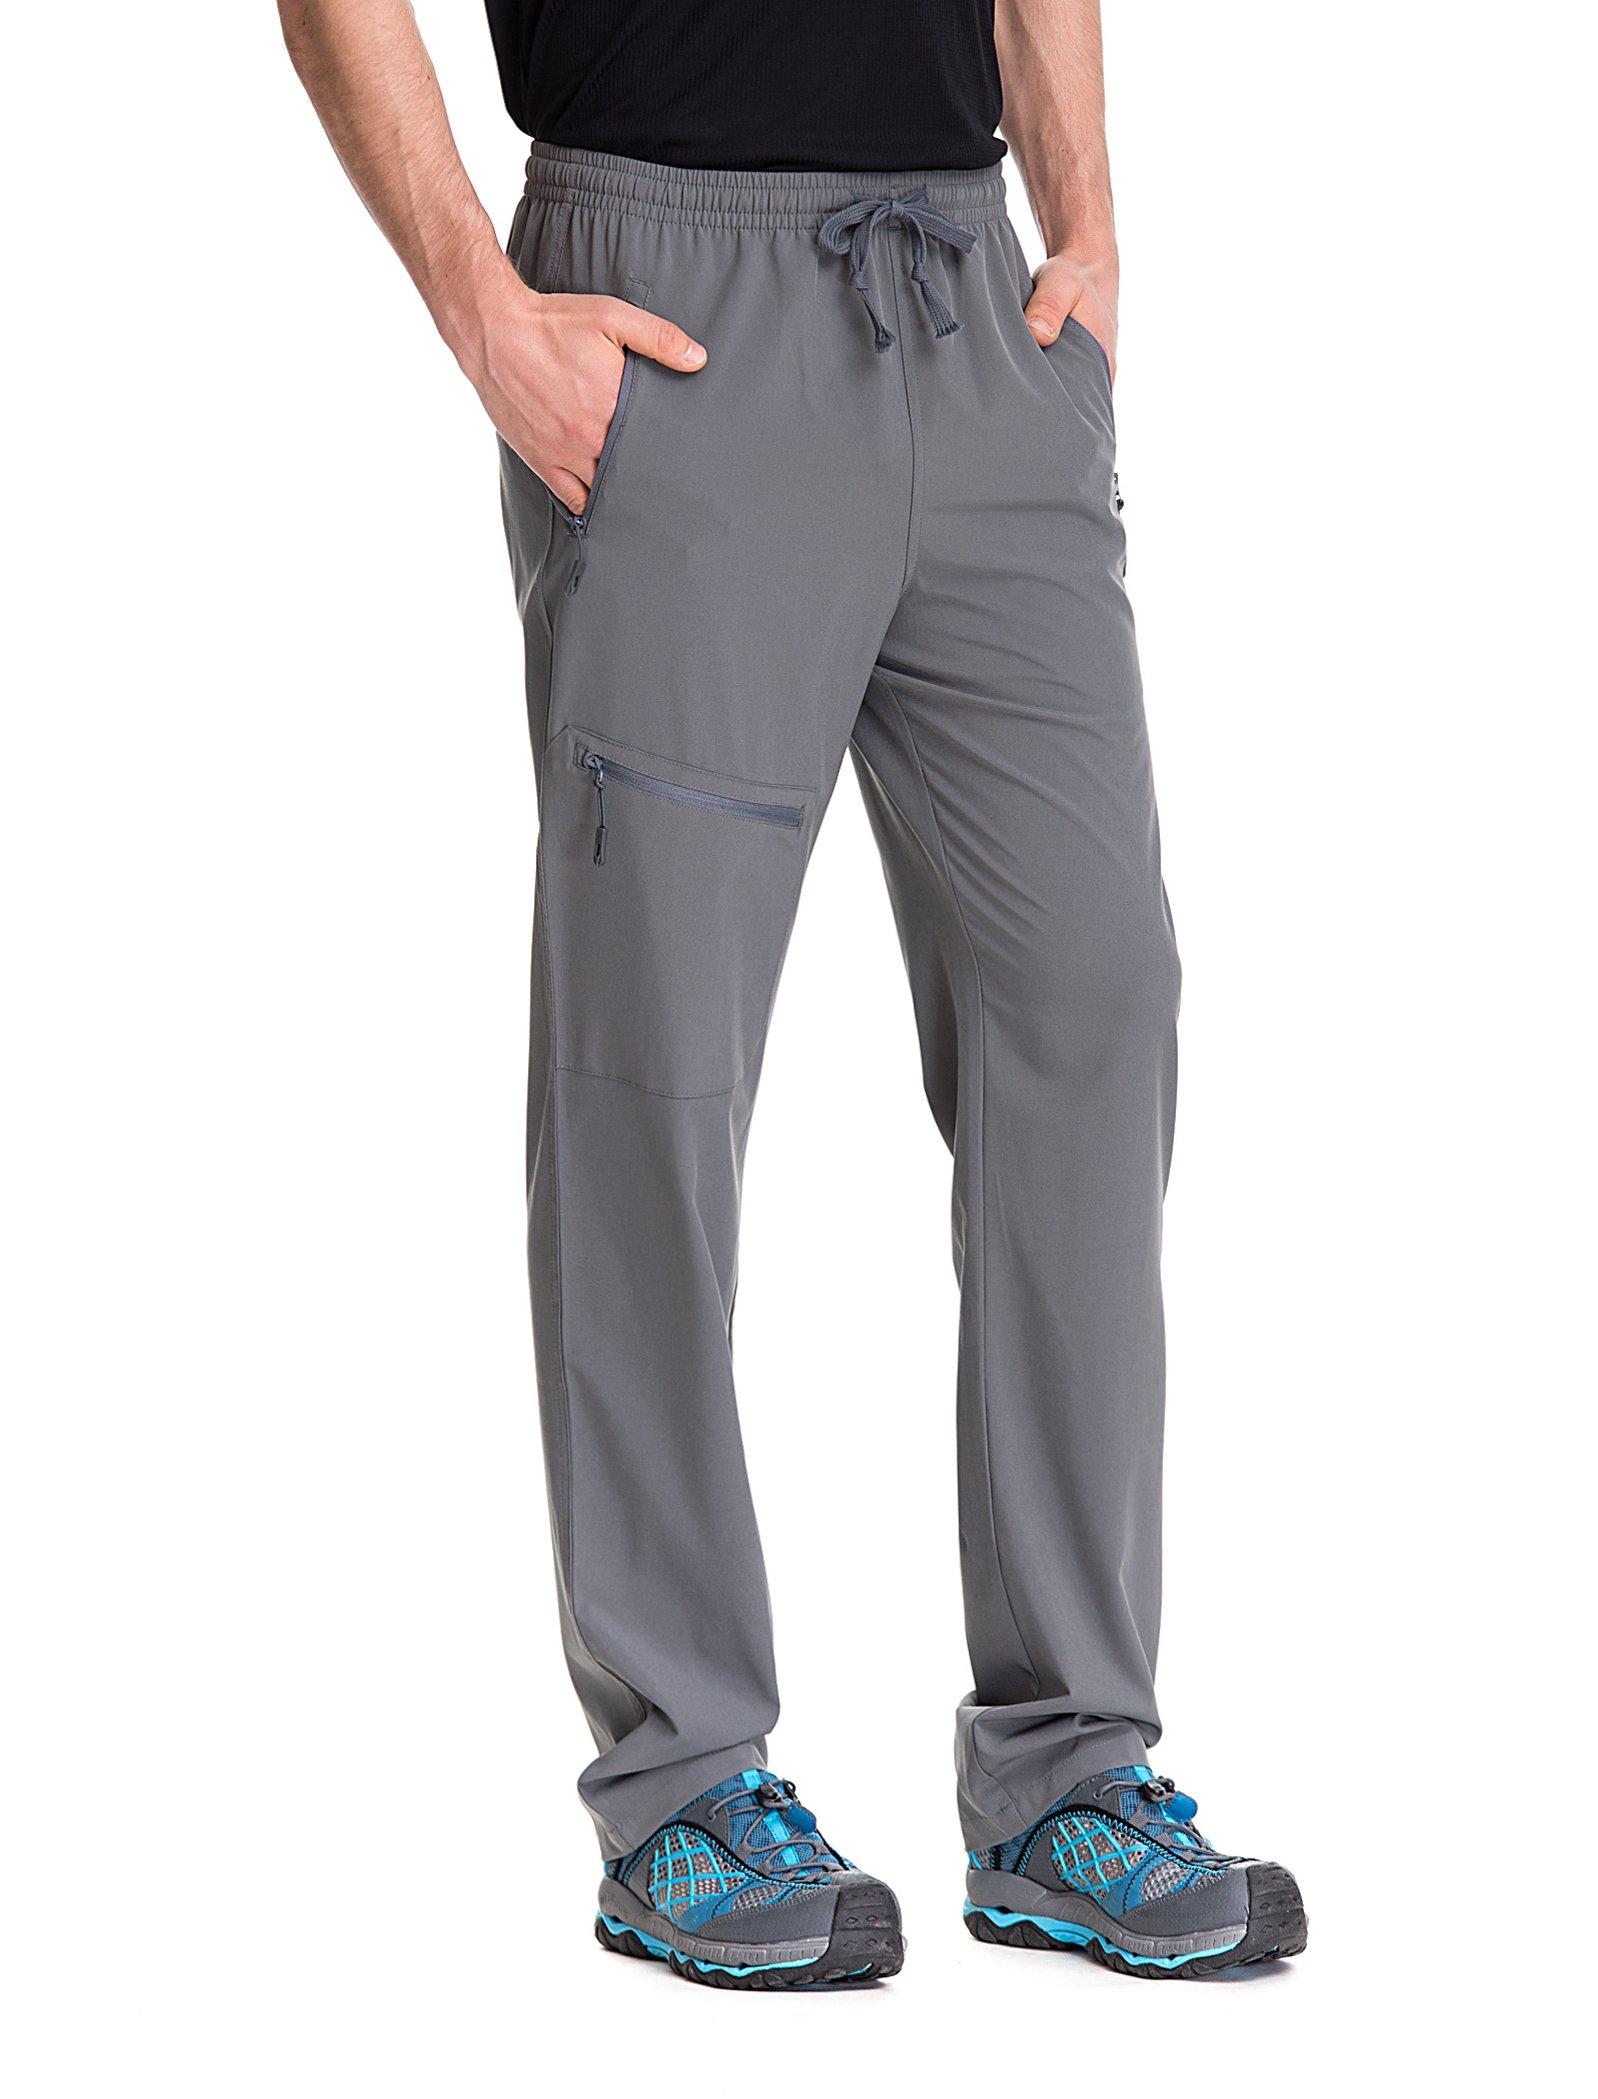 Trailside Supply Co. Men's Light Weight Stretch Elastic-Waist Drawstring Track Running Gym Pants Large Dark Grey